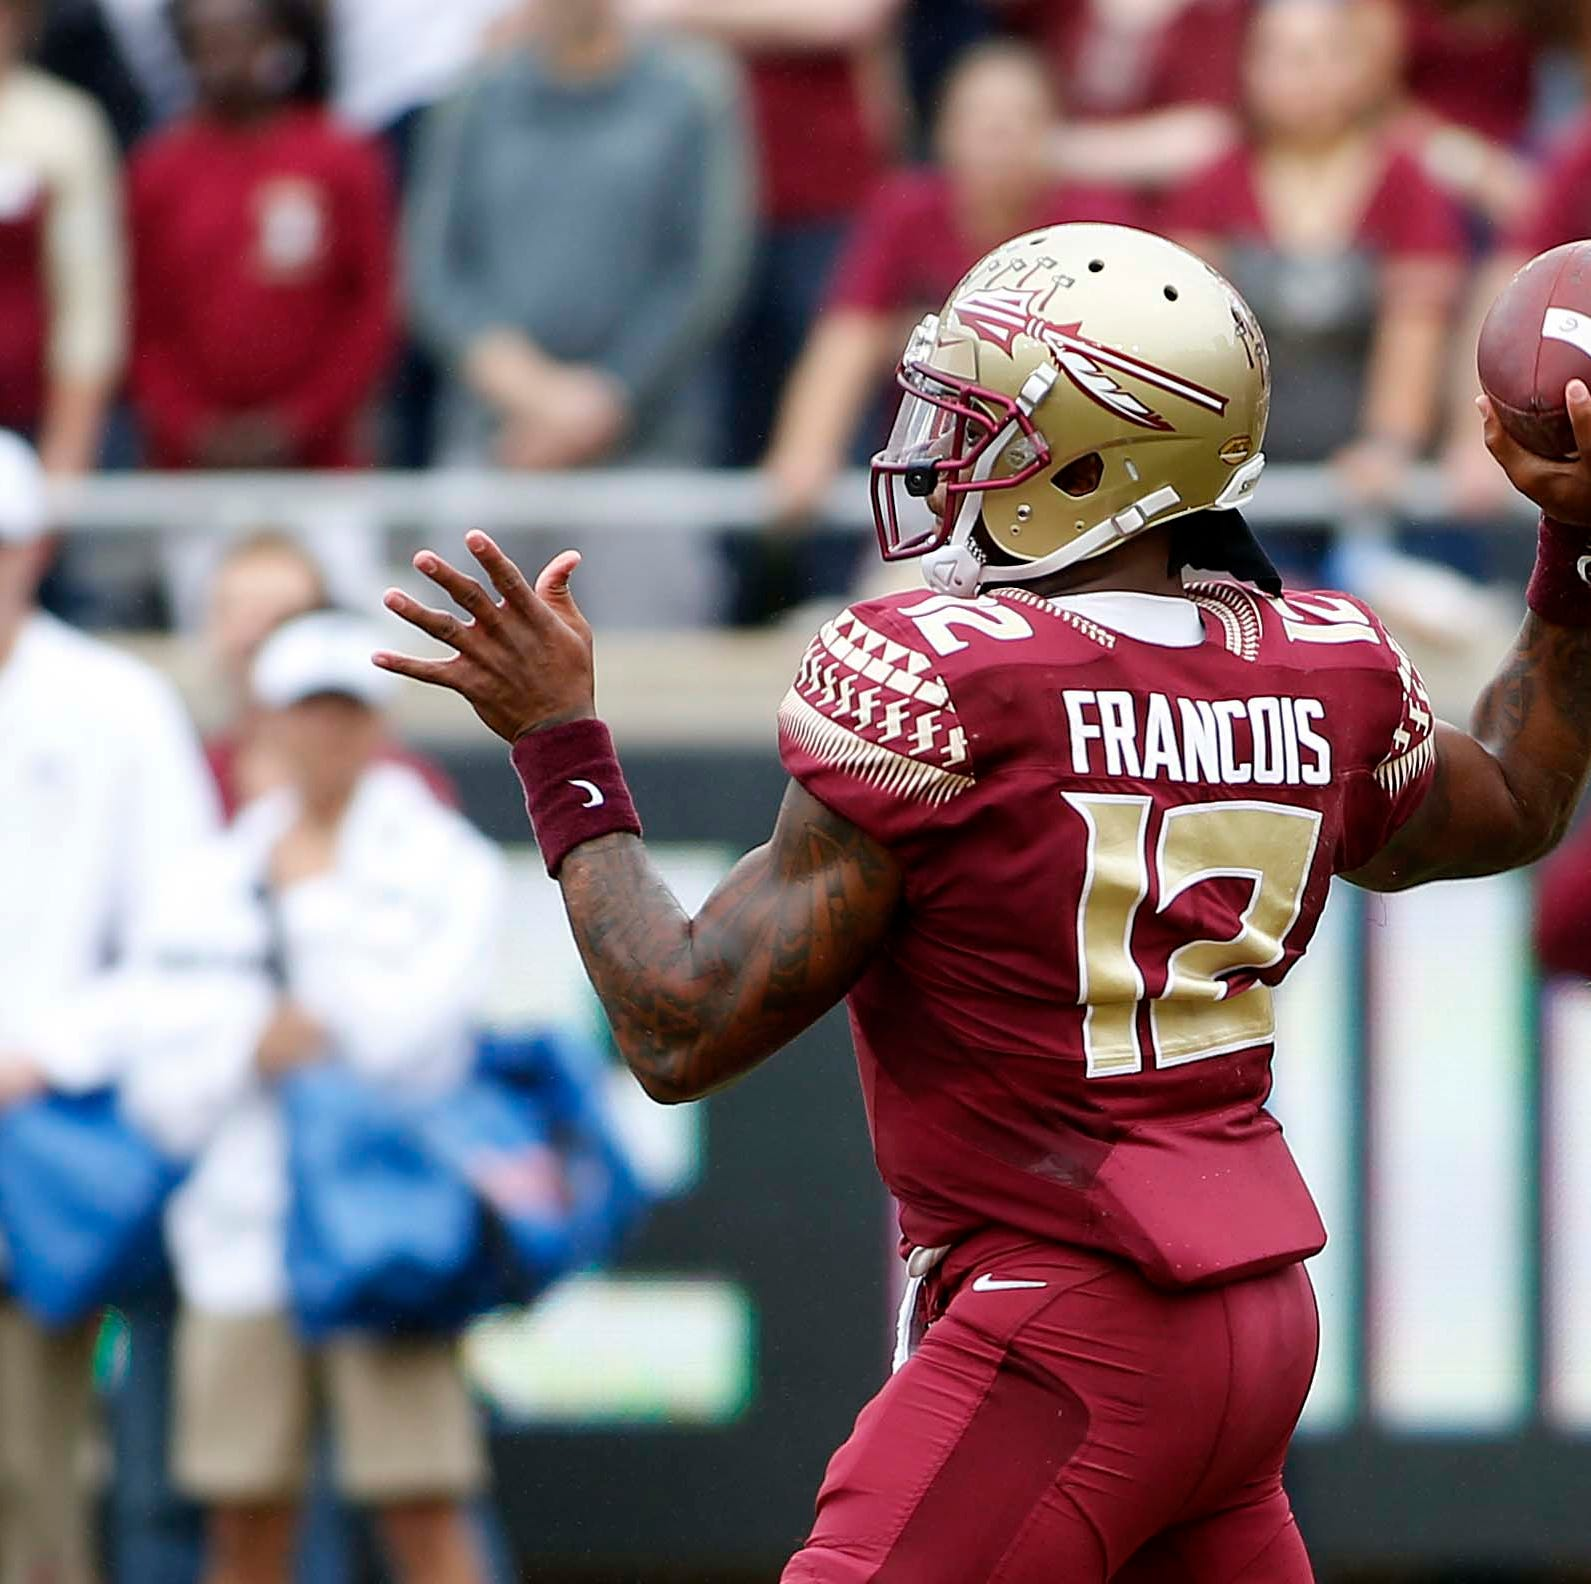 Report: Former Florida State quarterback Deondre Francois transferring to FAU